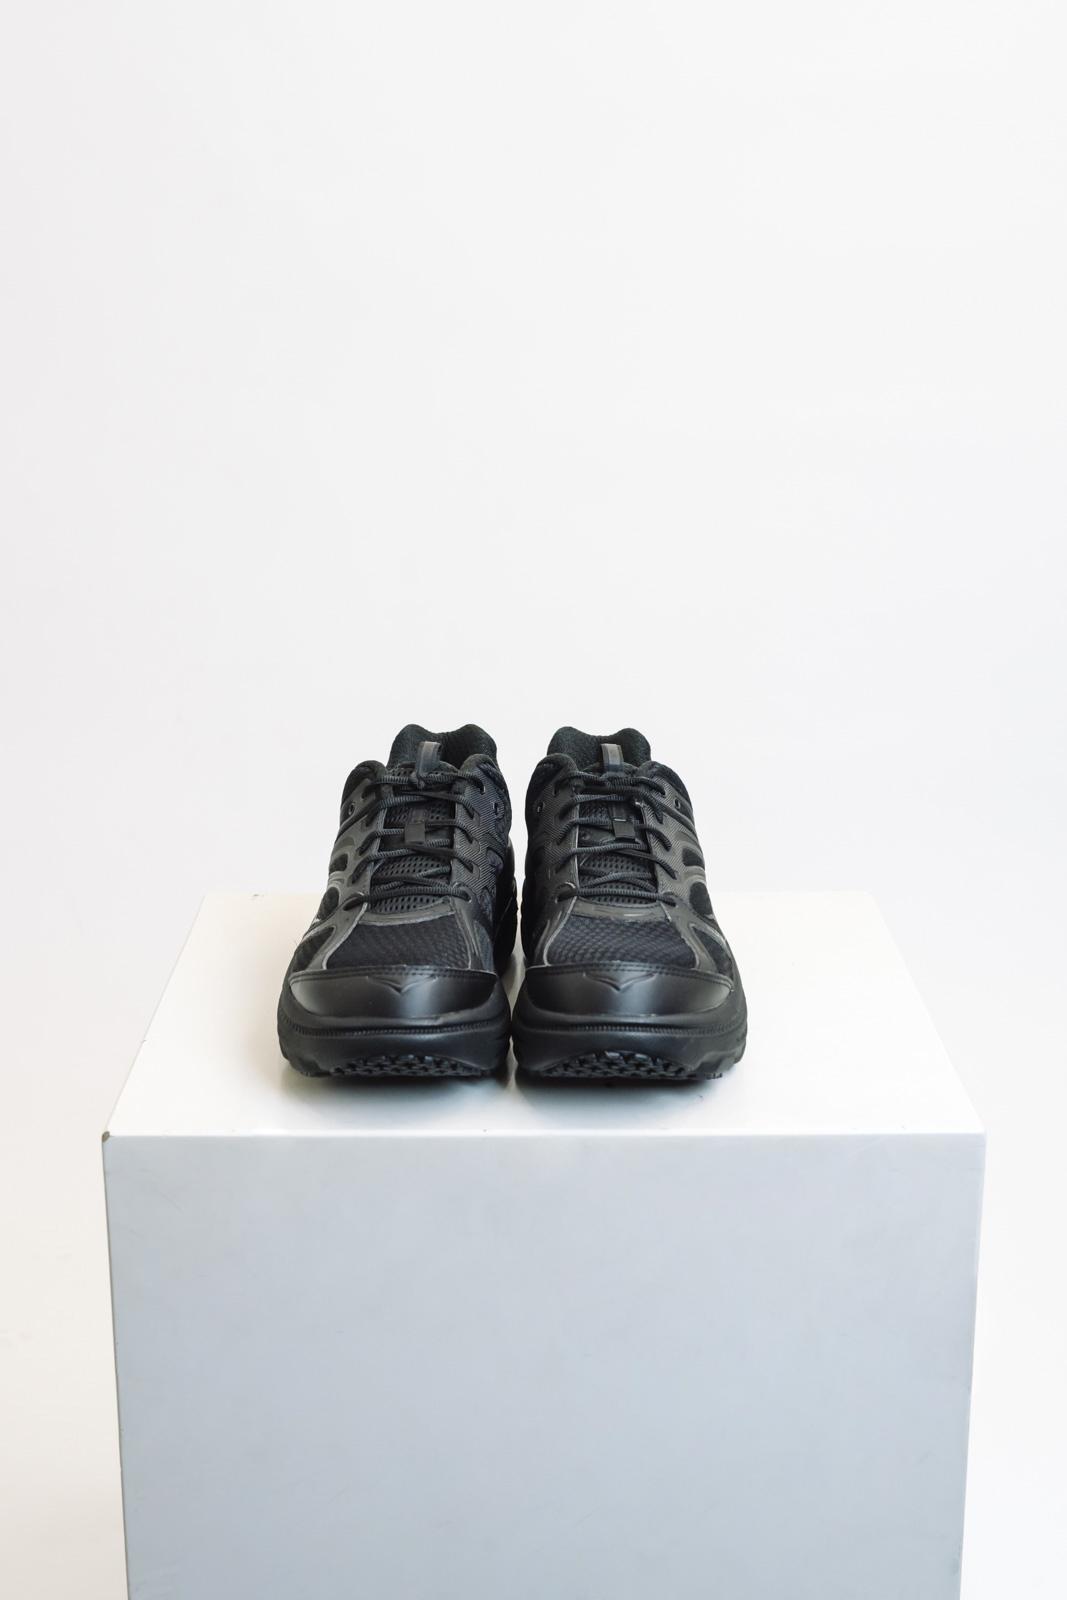 Hoka Engineered Garments black